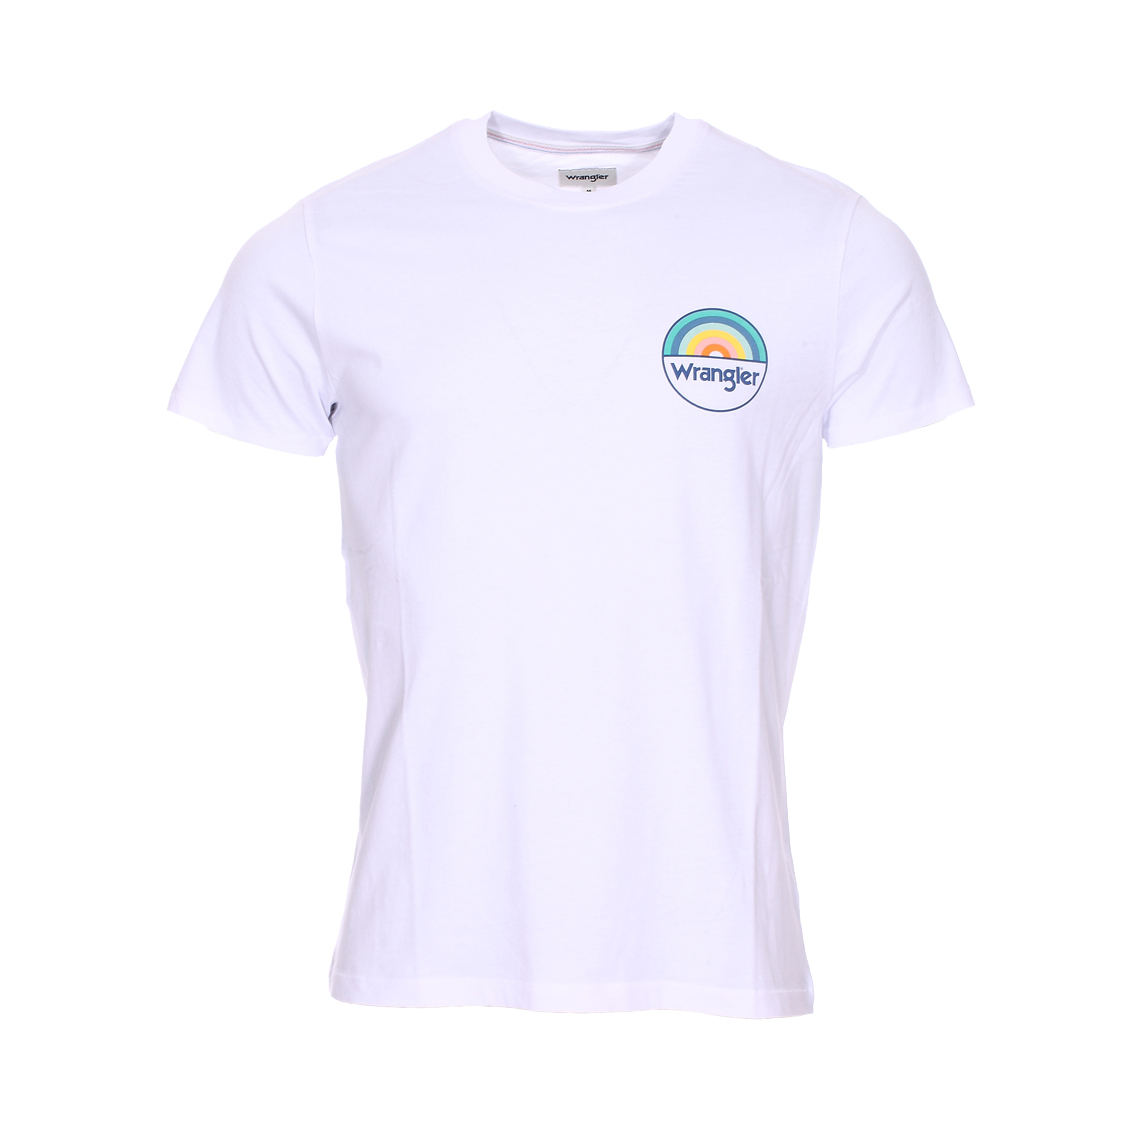 Tee-shirt col rond  rainbow en coton blanc floqué